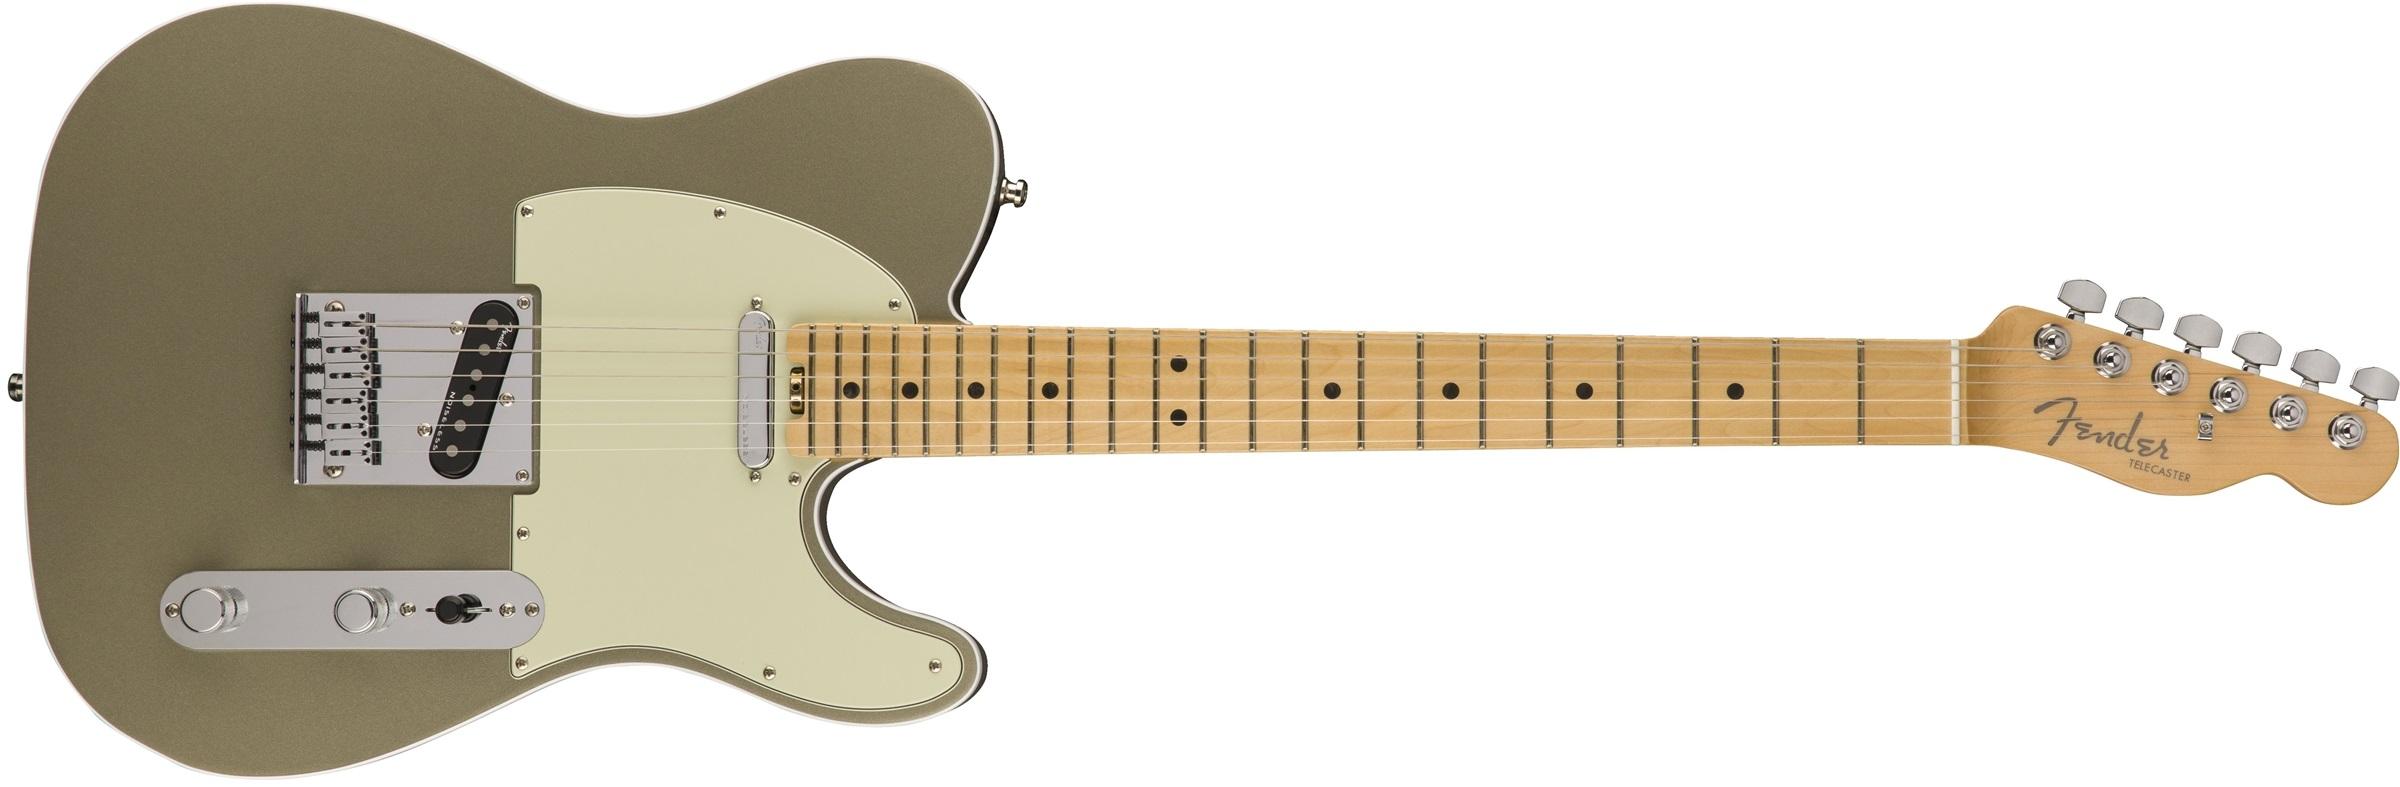 Fender American Elite Telecaster MN CHMP